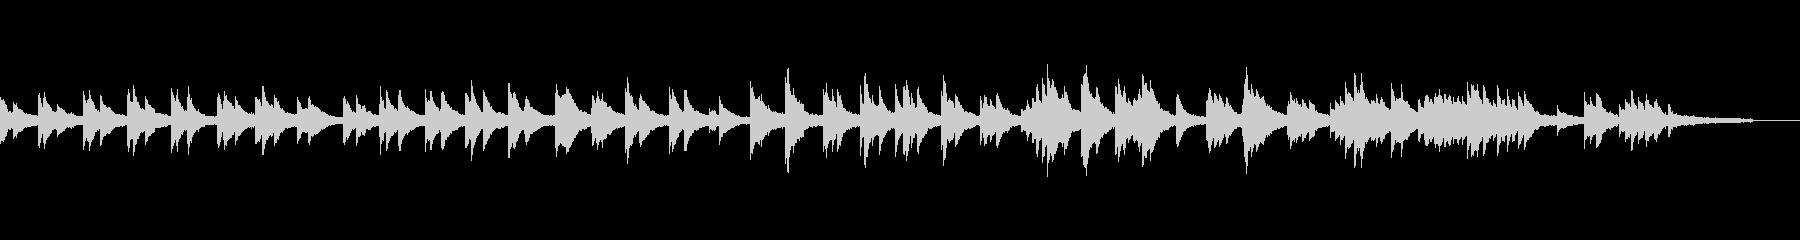 Cinematic Piano 2の未再生の波形